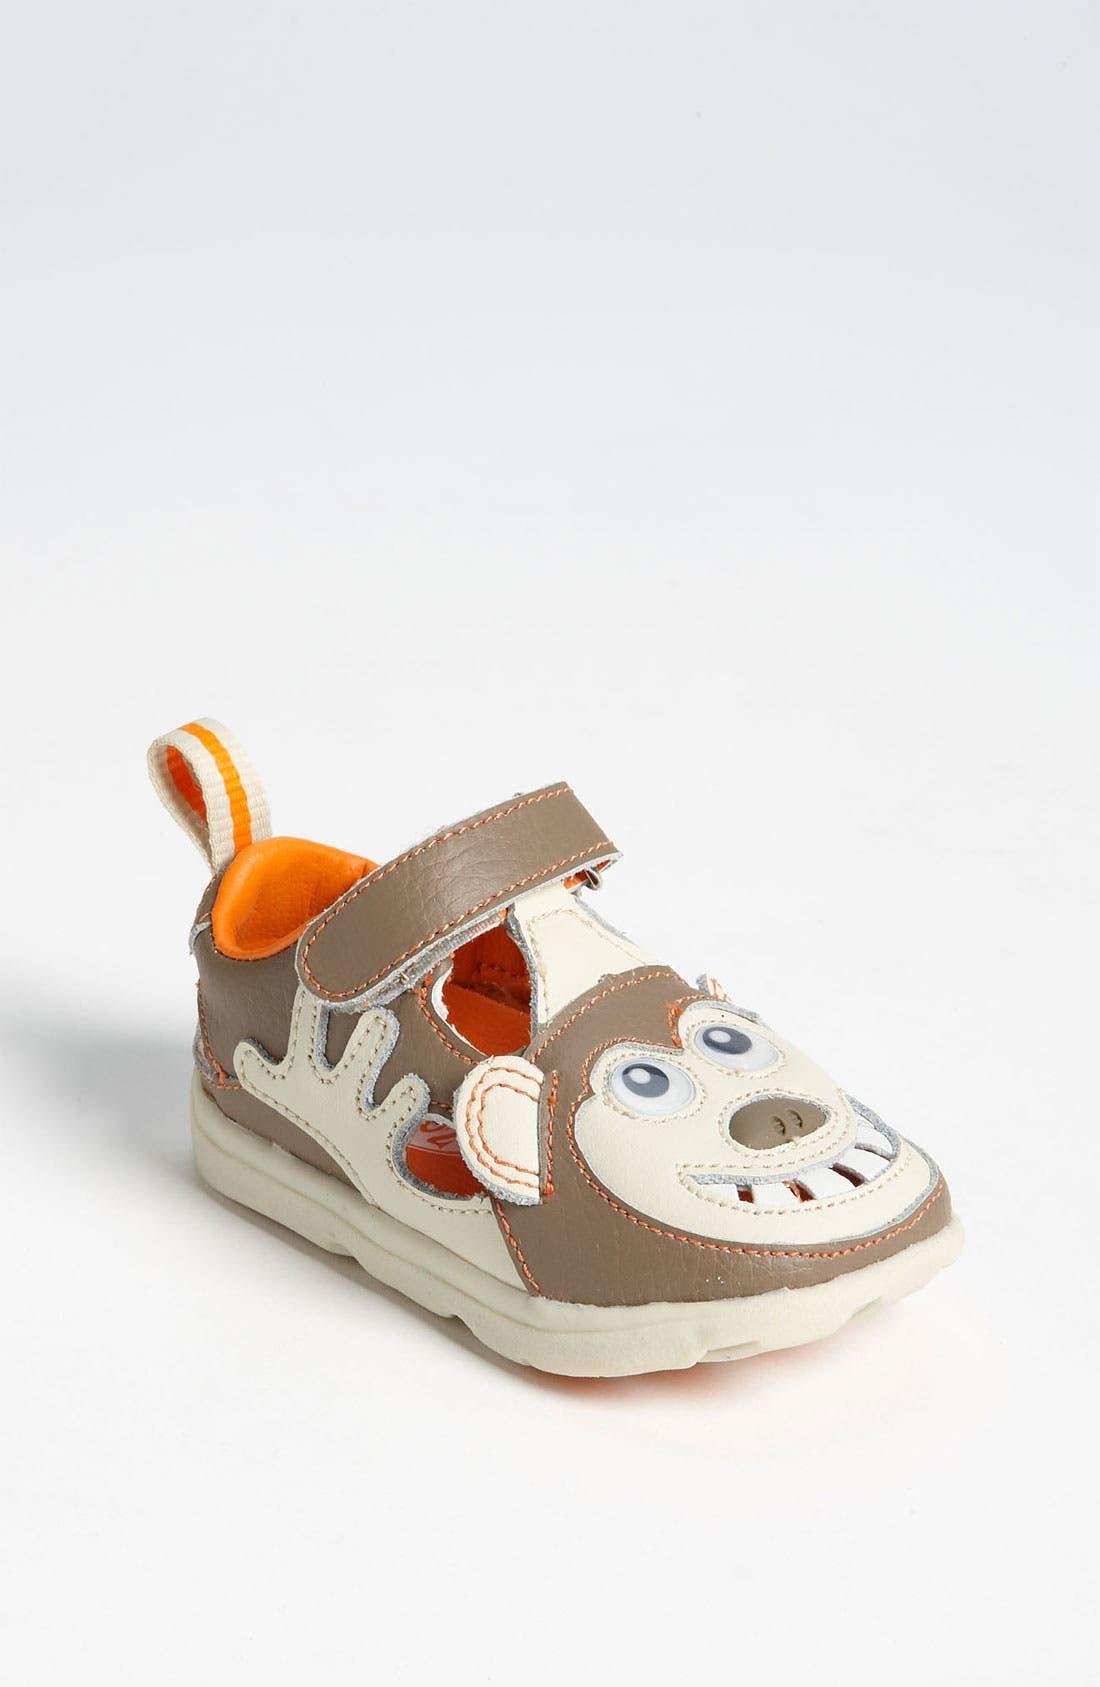 Main Image - Zooligans™ 'Monkey' Sport Sandal (Baby, Walker & Toddler)